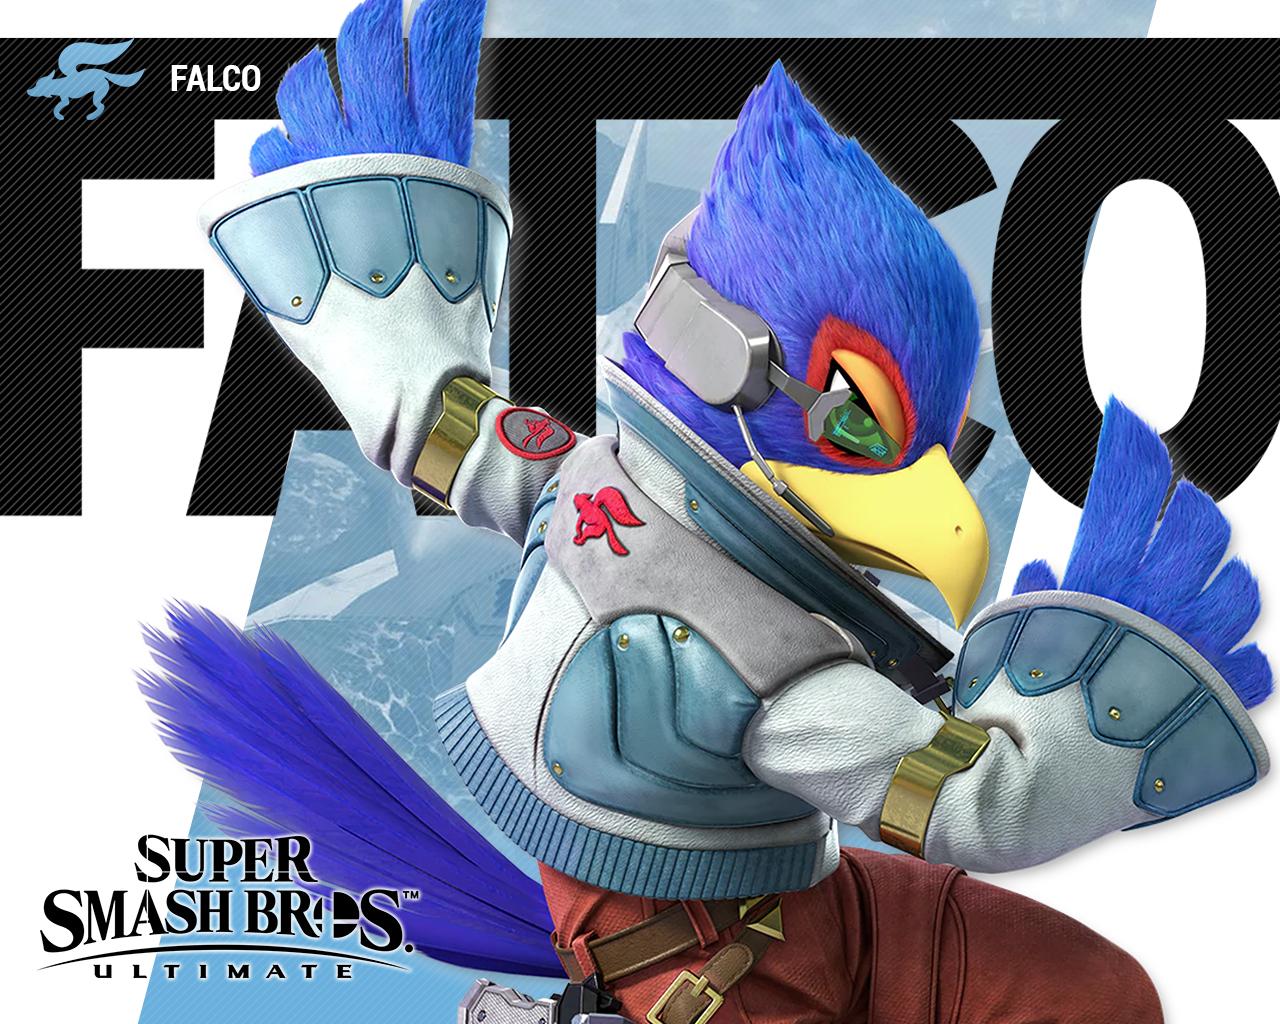 super smash bros ultimate falco wallpapers